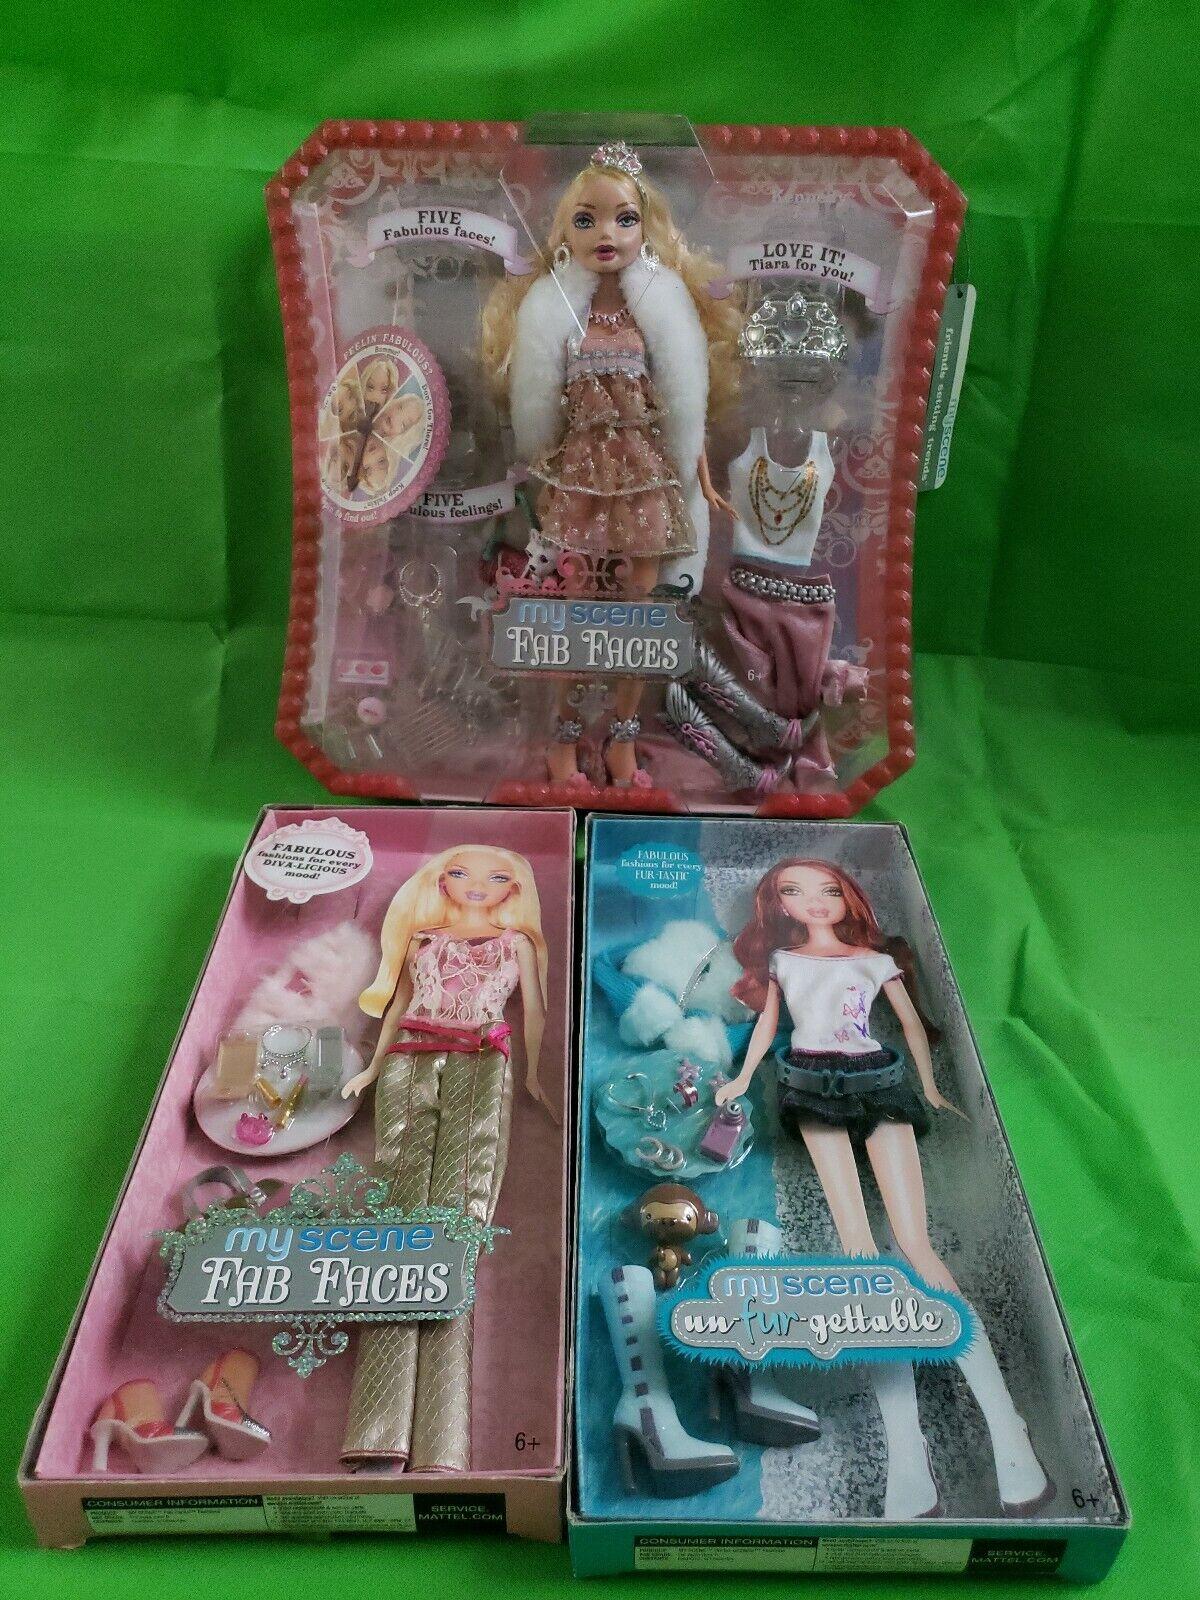 2006 Barbie My Scene FAB caras Kennedy Muñeca y vestido Lote